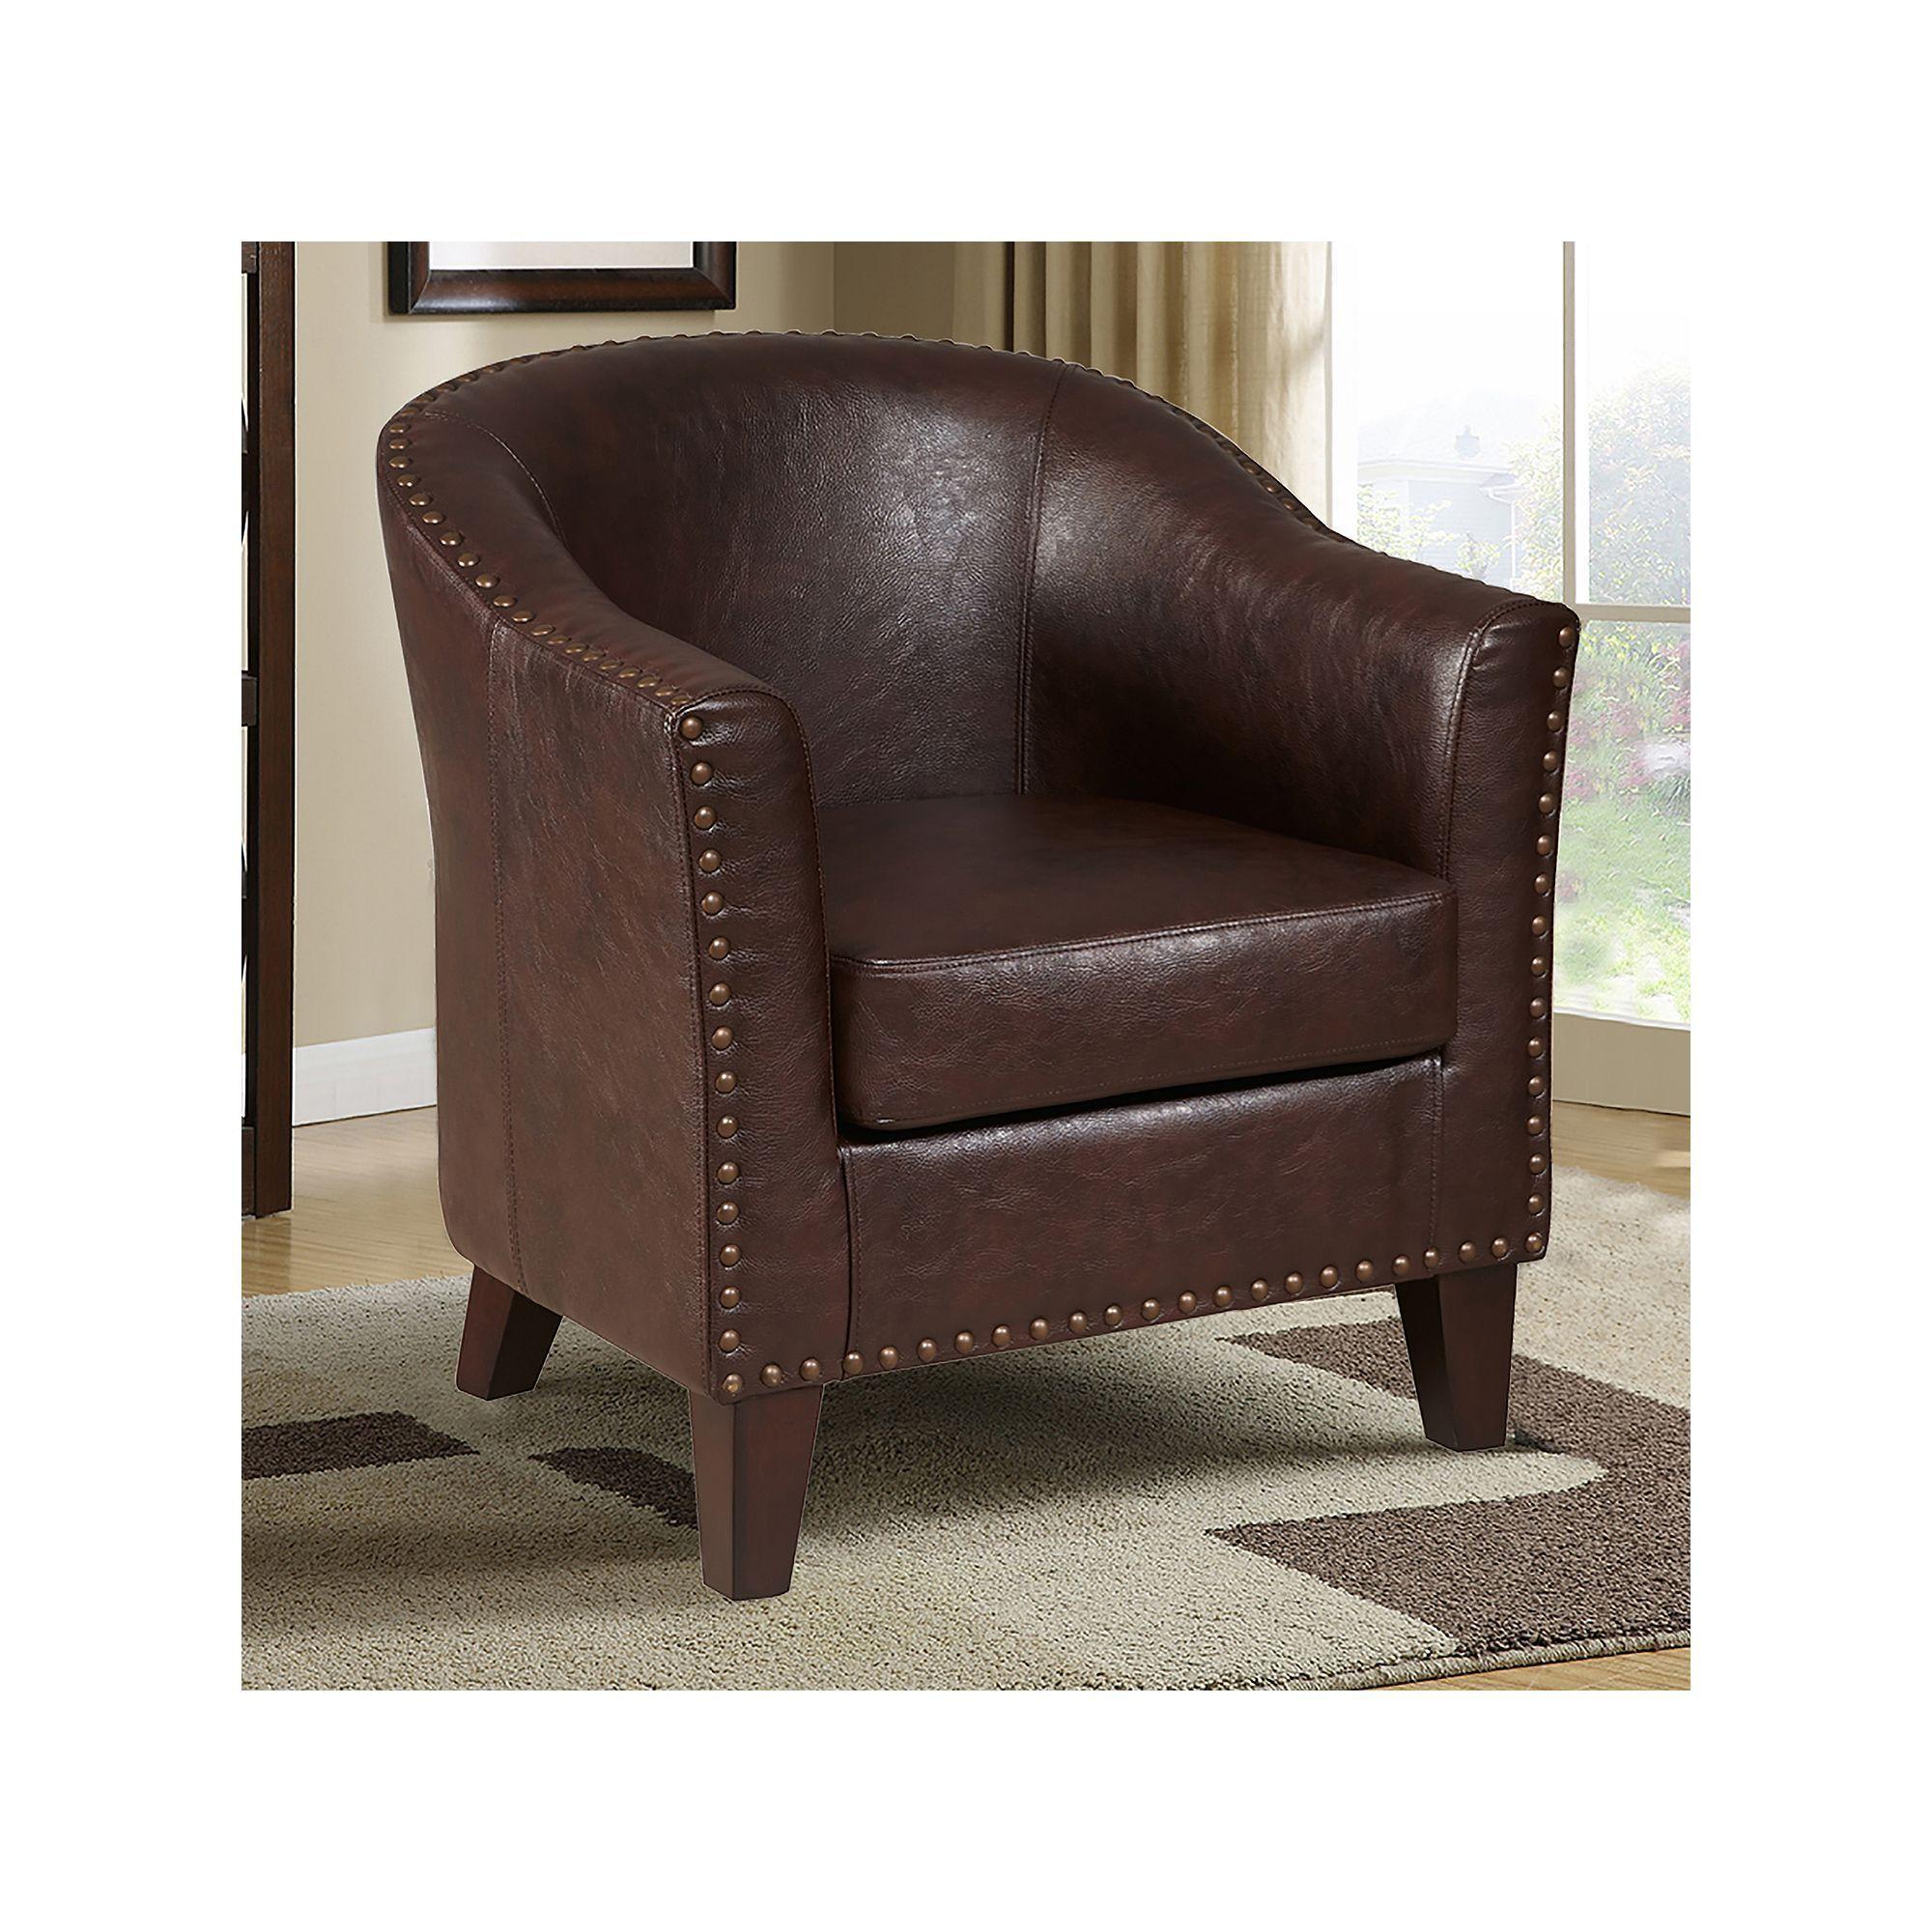 Awe Inspiring Pulaski Nailhead Faux Leather Tub Chair Products Accent Creativecarmelina Interior Chair Design Creativecarmelinacom